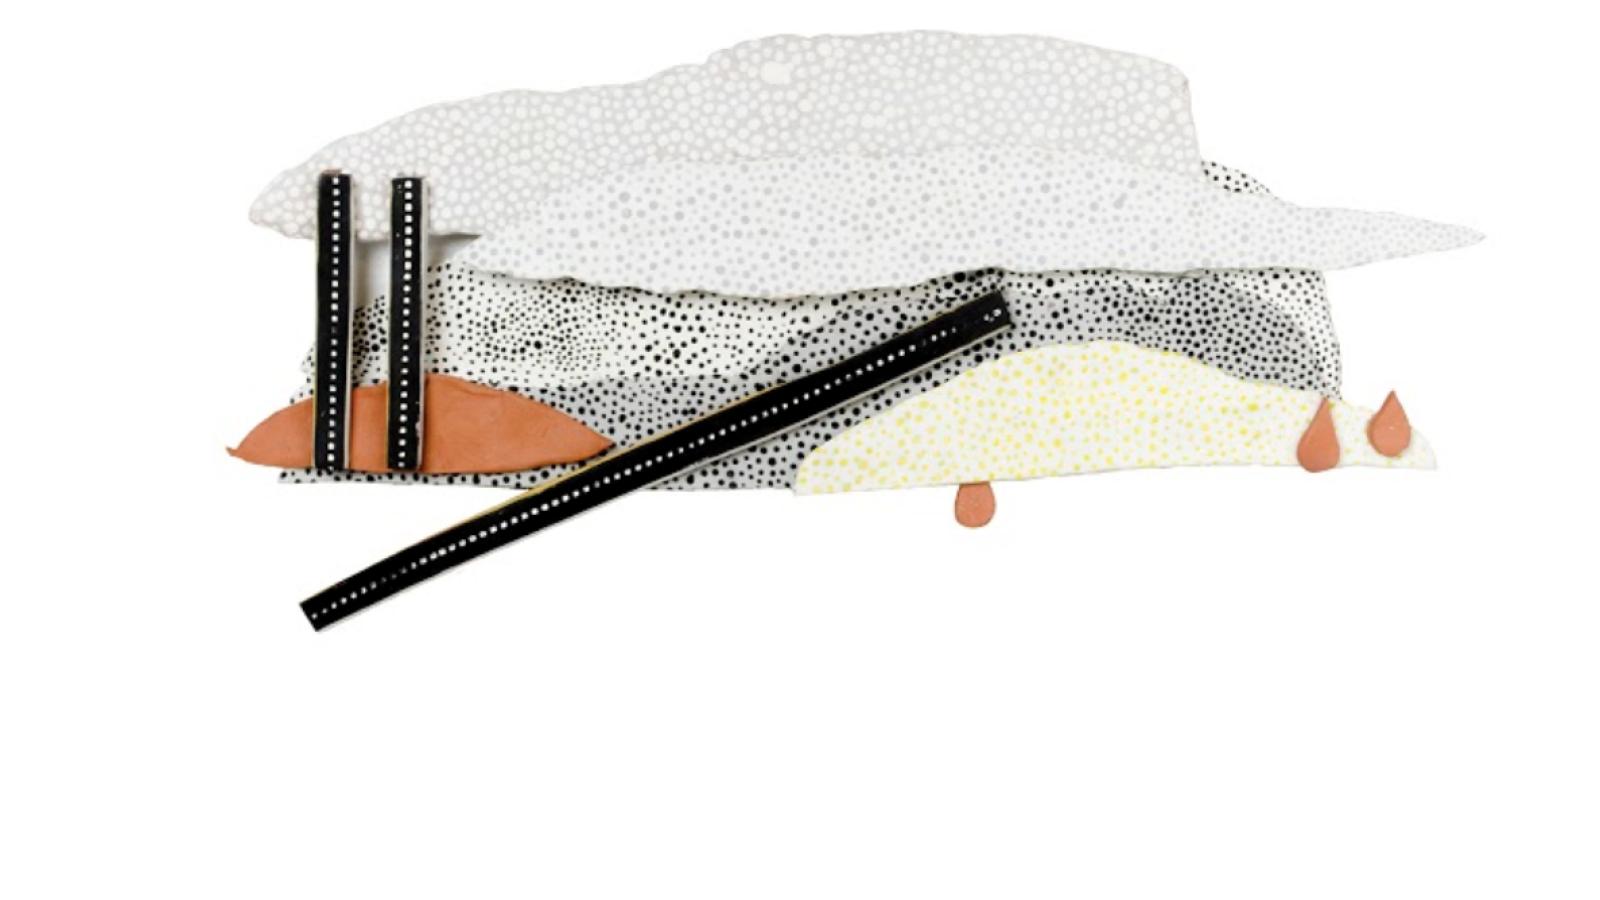 Liz Langyher artwork